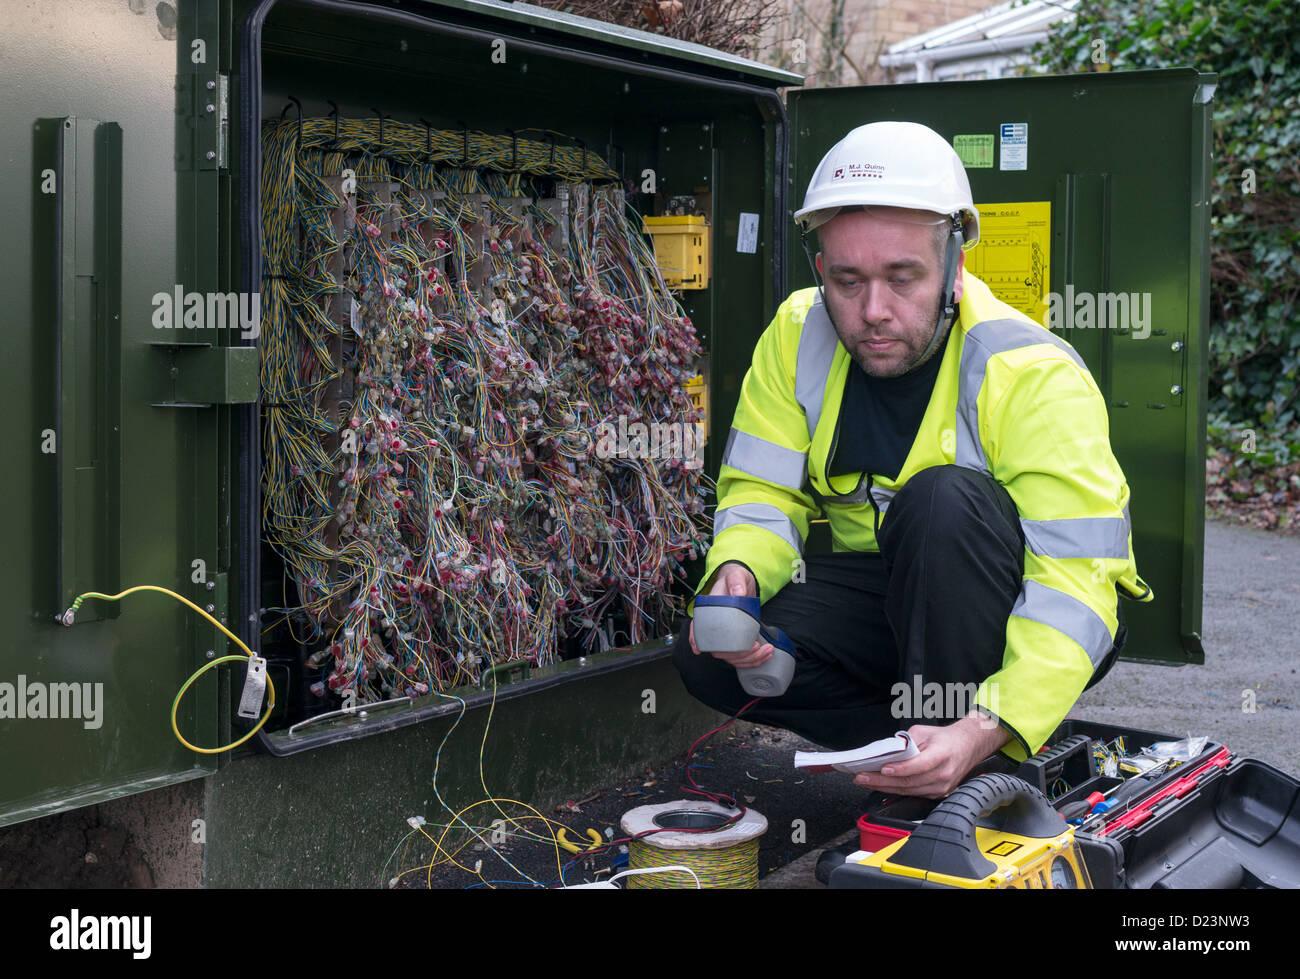 A technician installing fibre optic broadband north east England UK Stock Photo